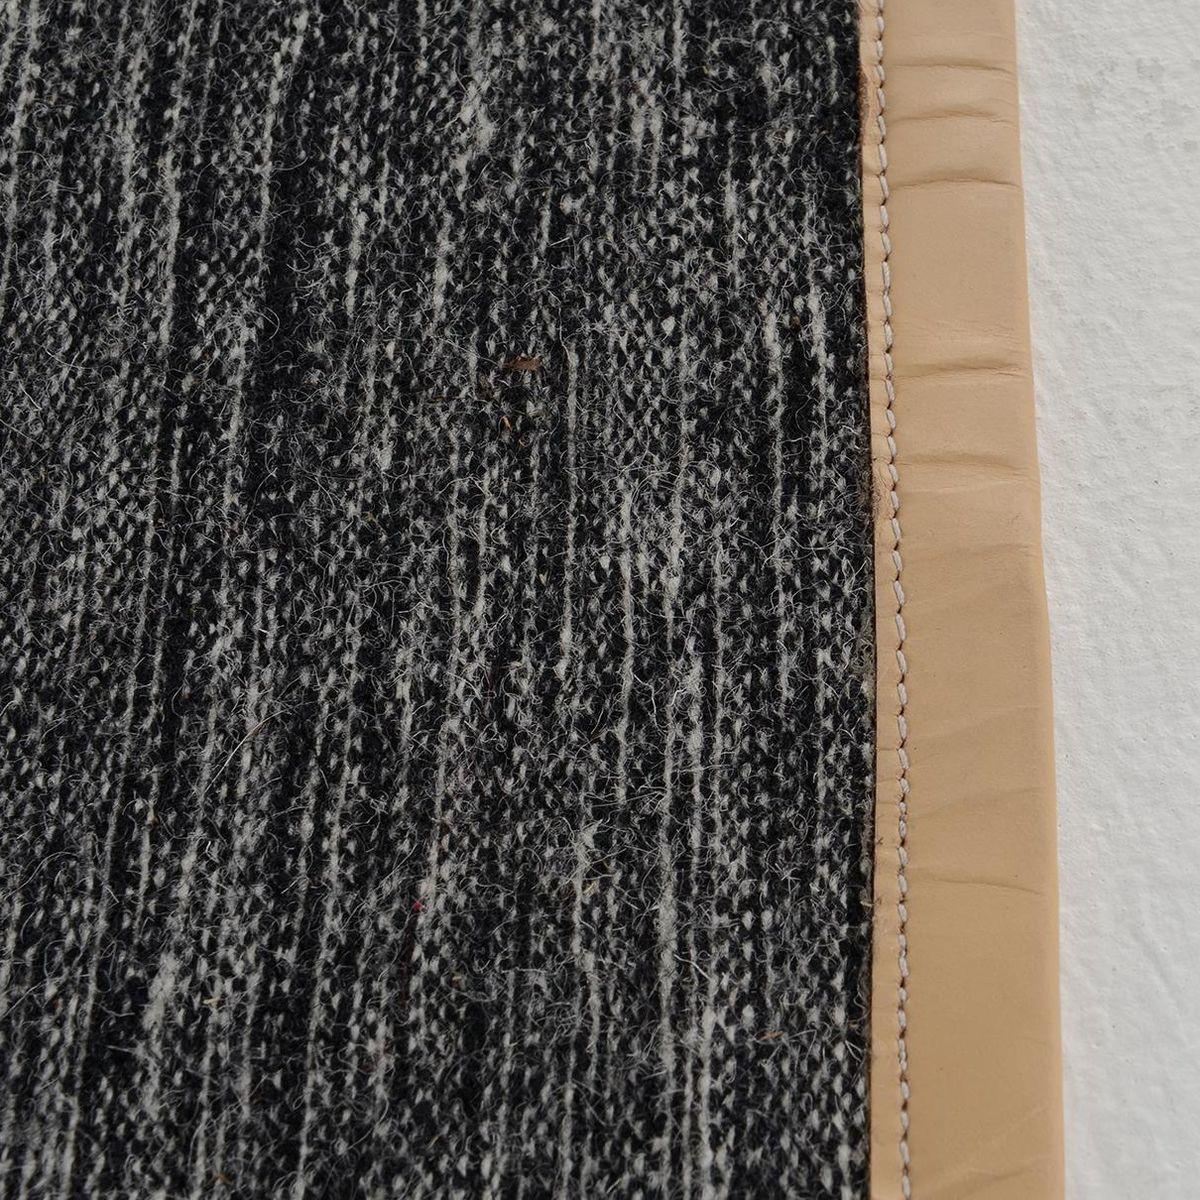 Bj rk teppich designhousestockholm lena bergstr m for Vitra design teppich